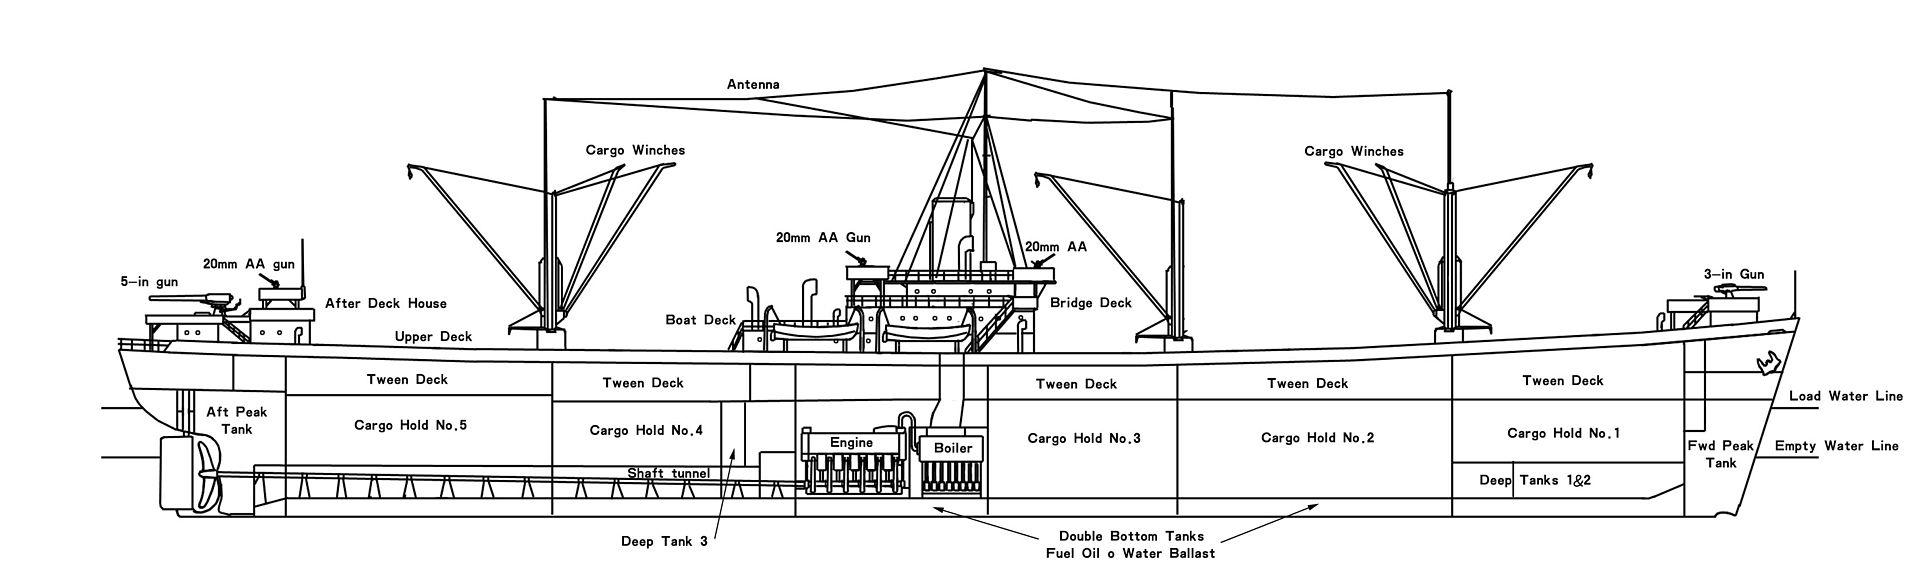 Liberty Ship2